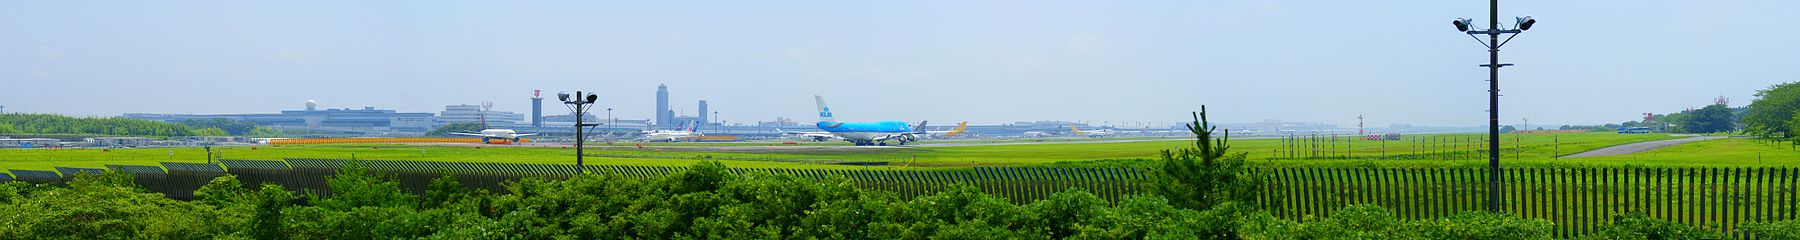 The Panorama view of Tokyo narita airport.jpg